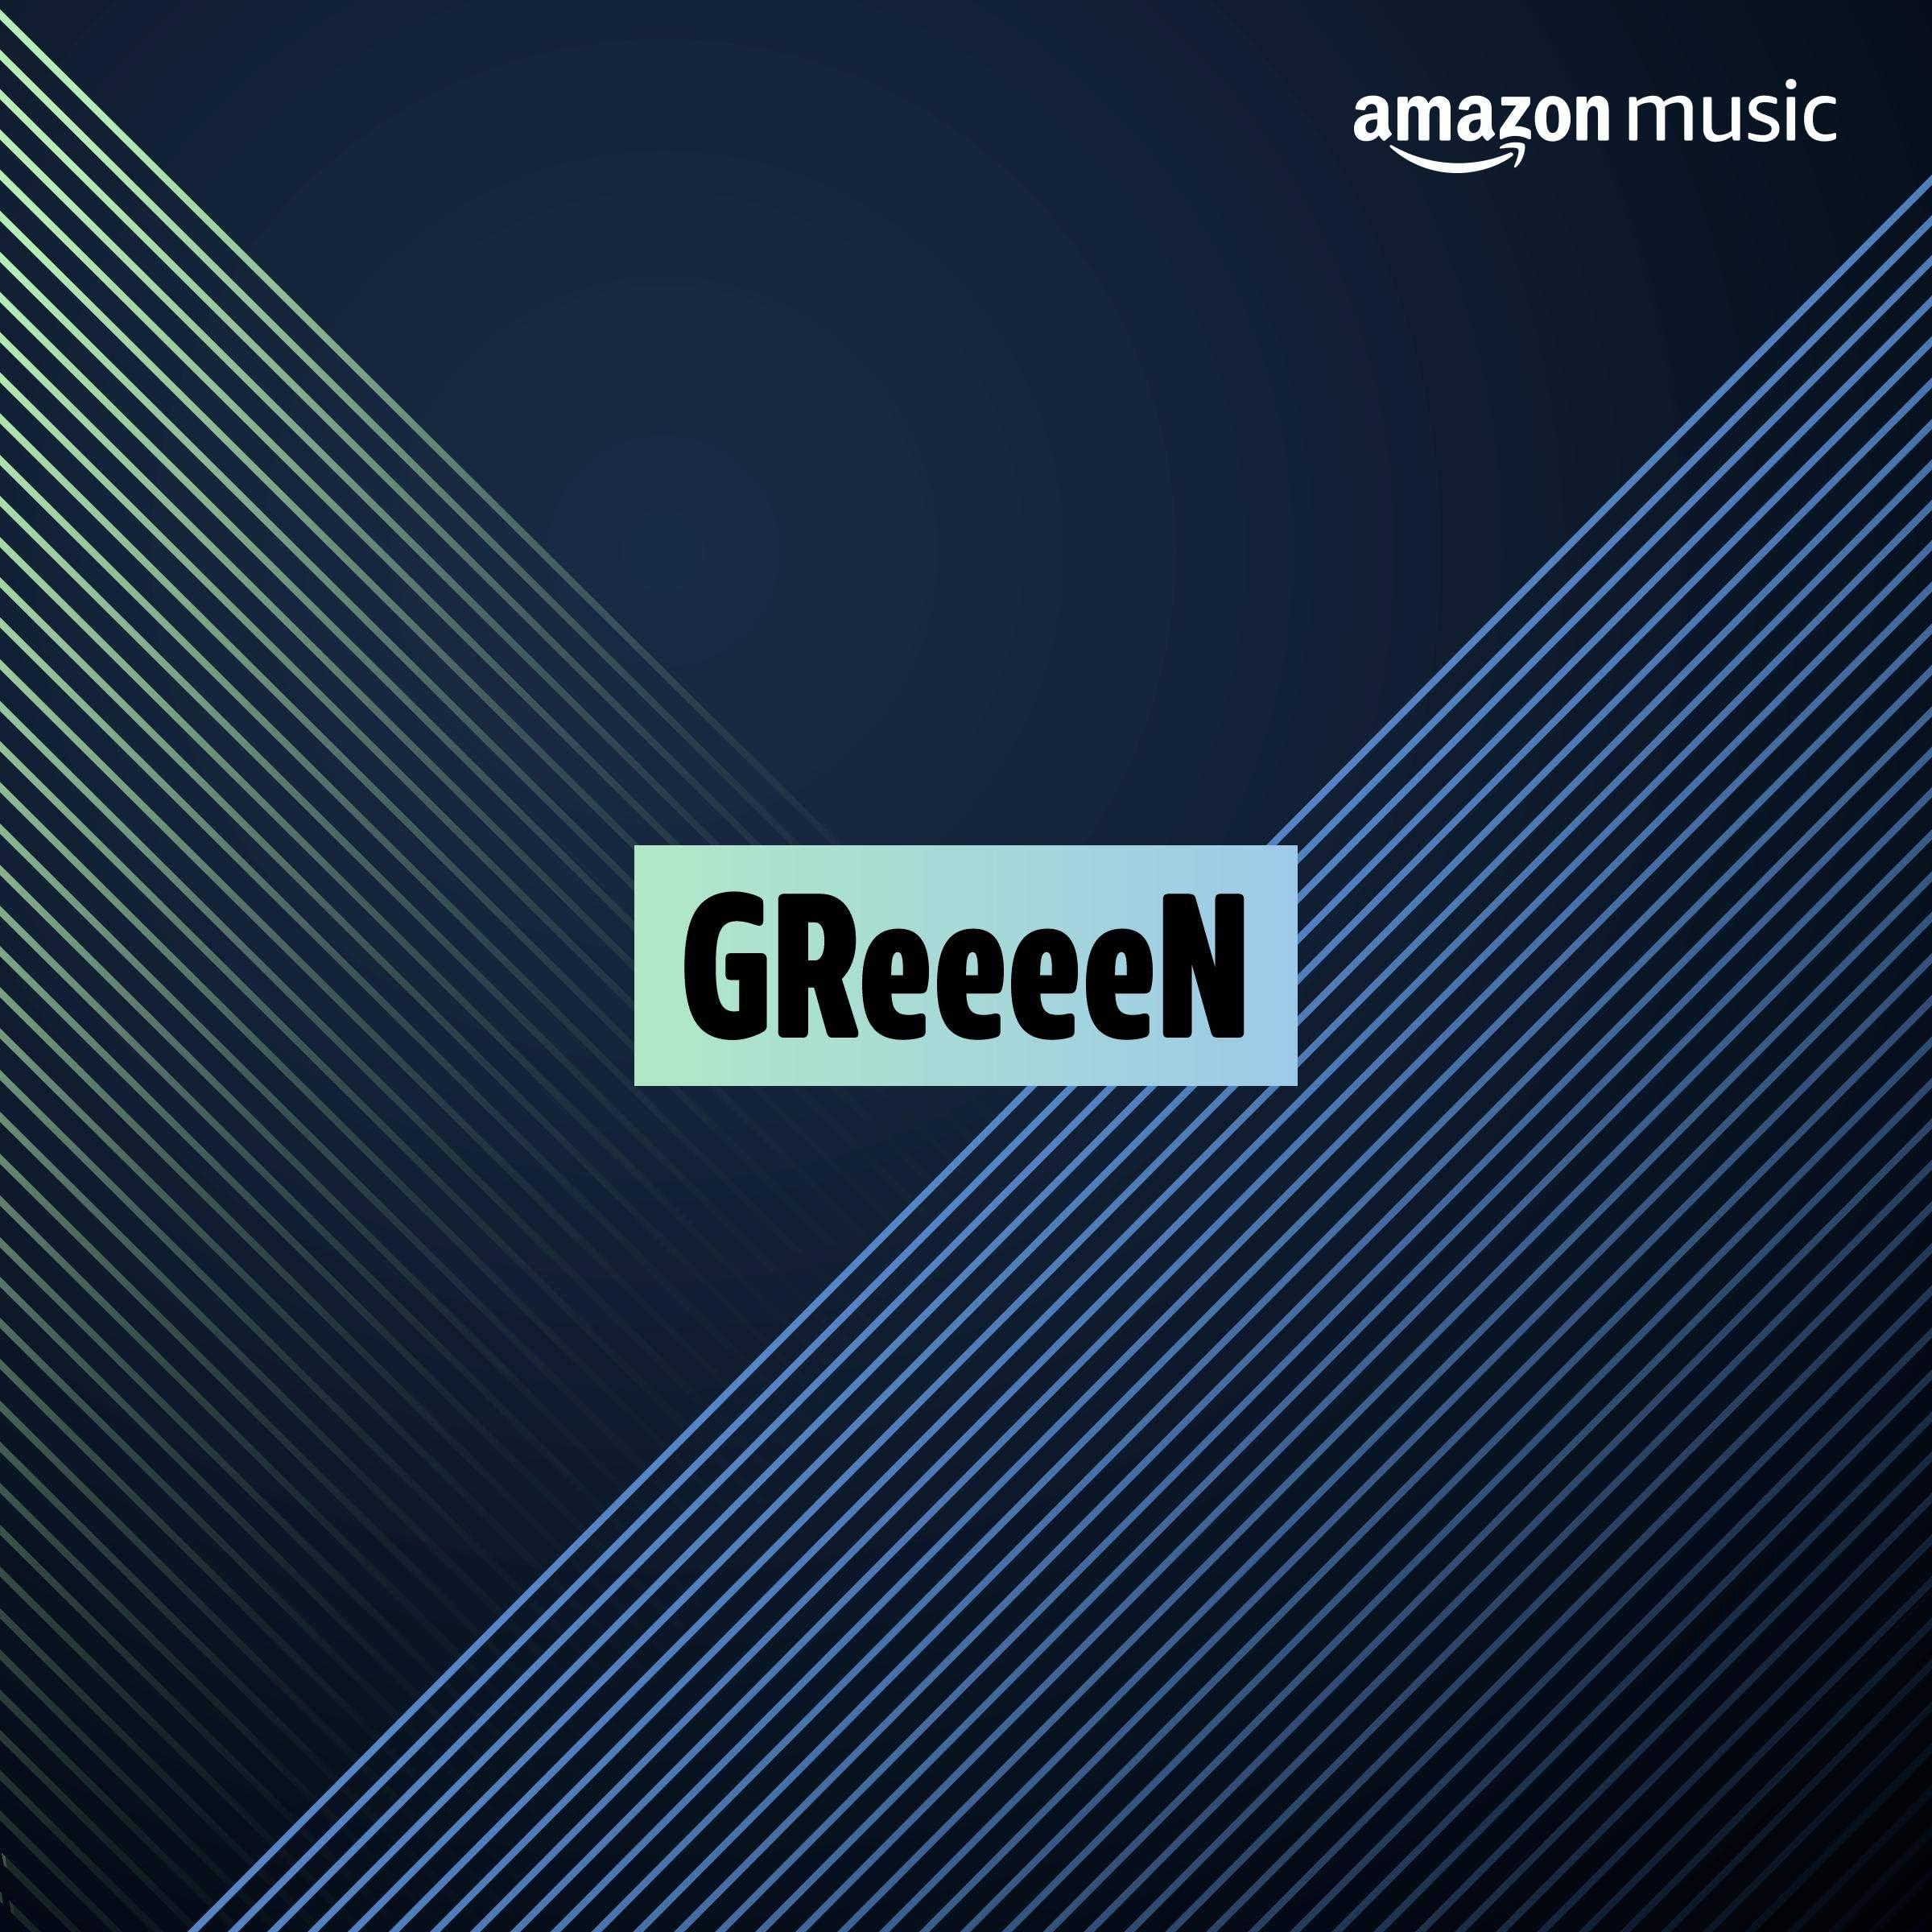 GReeeeNを聴いているお客様におすすめ